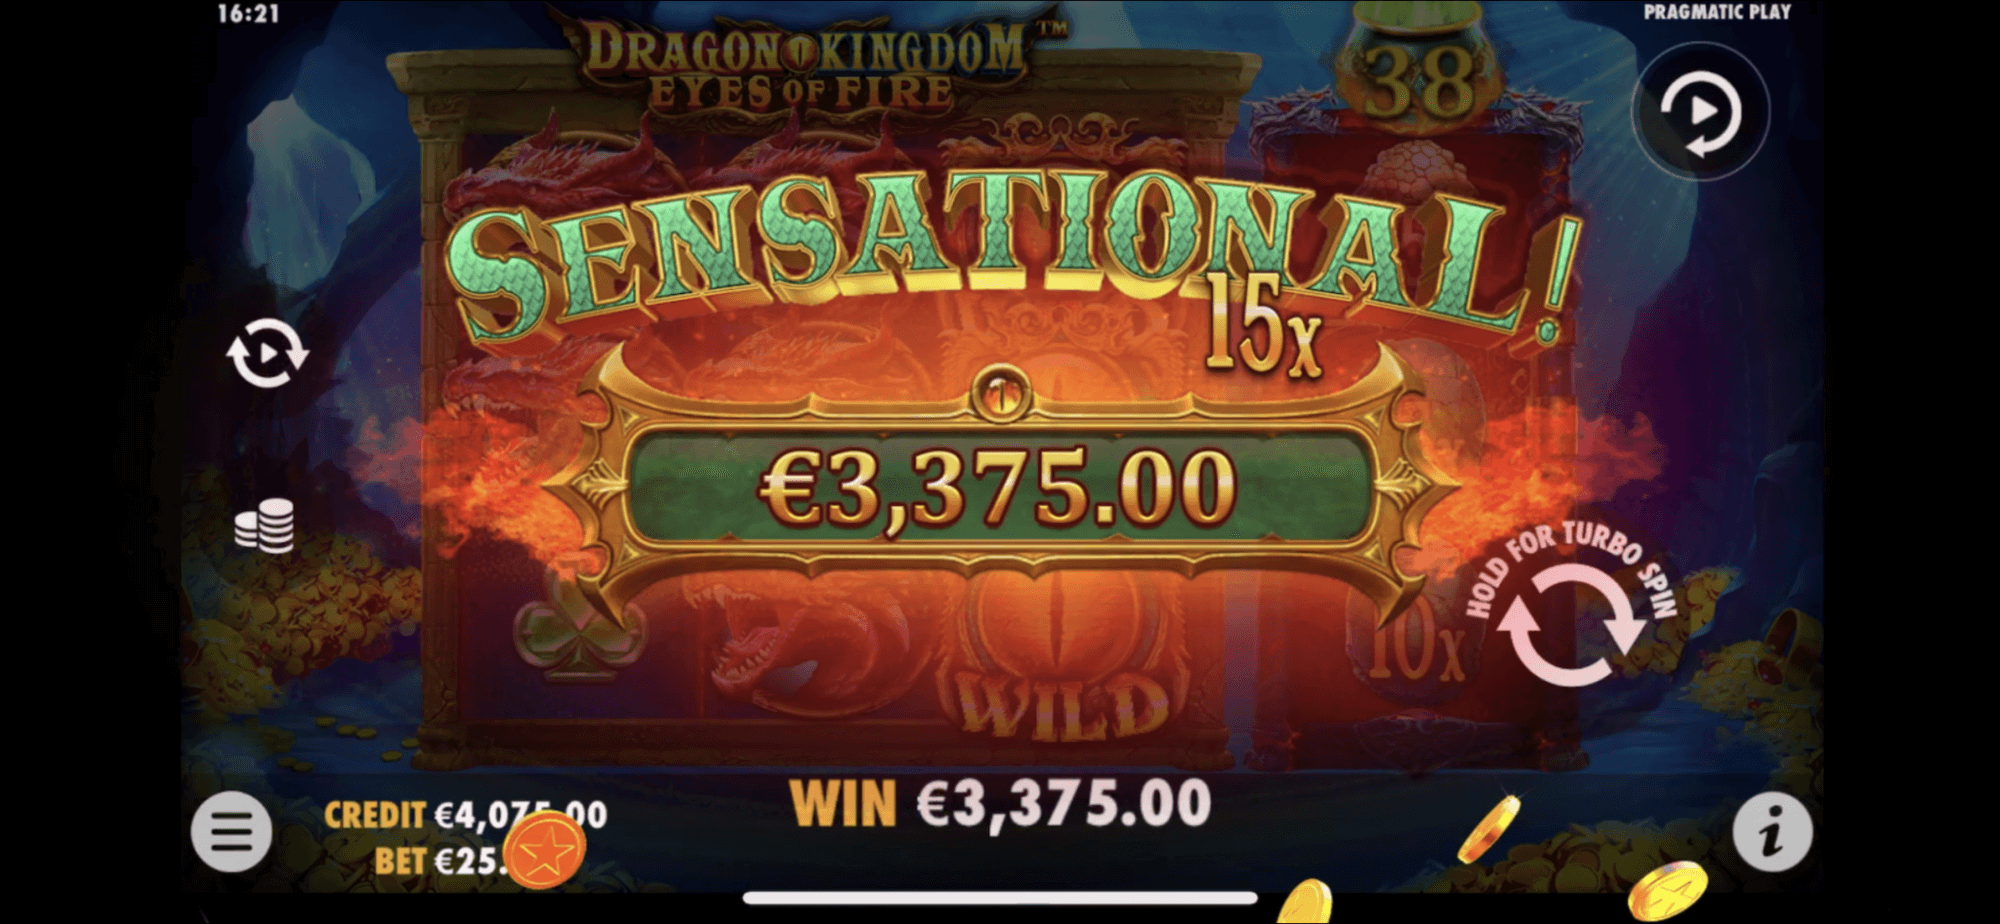 Dragon-Kingdom-Eyes-of-Fire-Pragmatic-Play-win